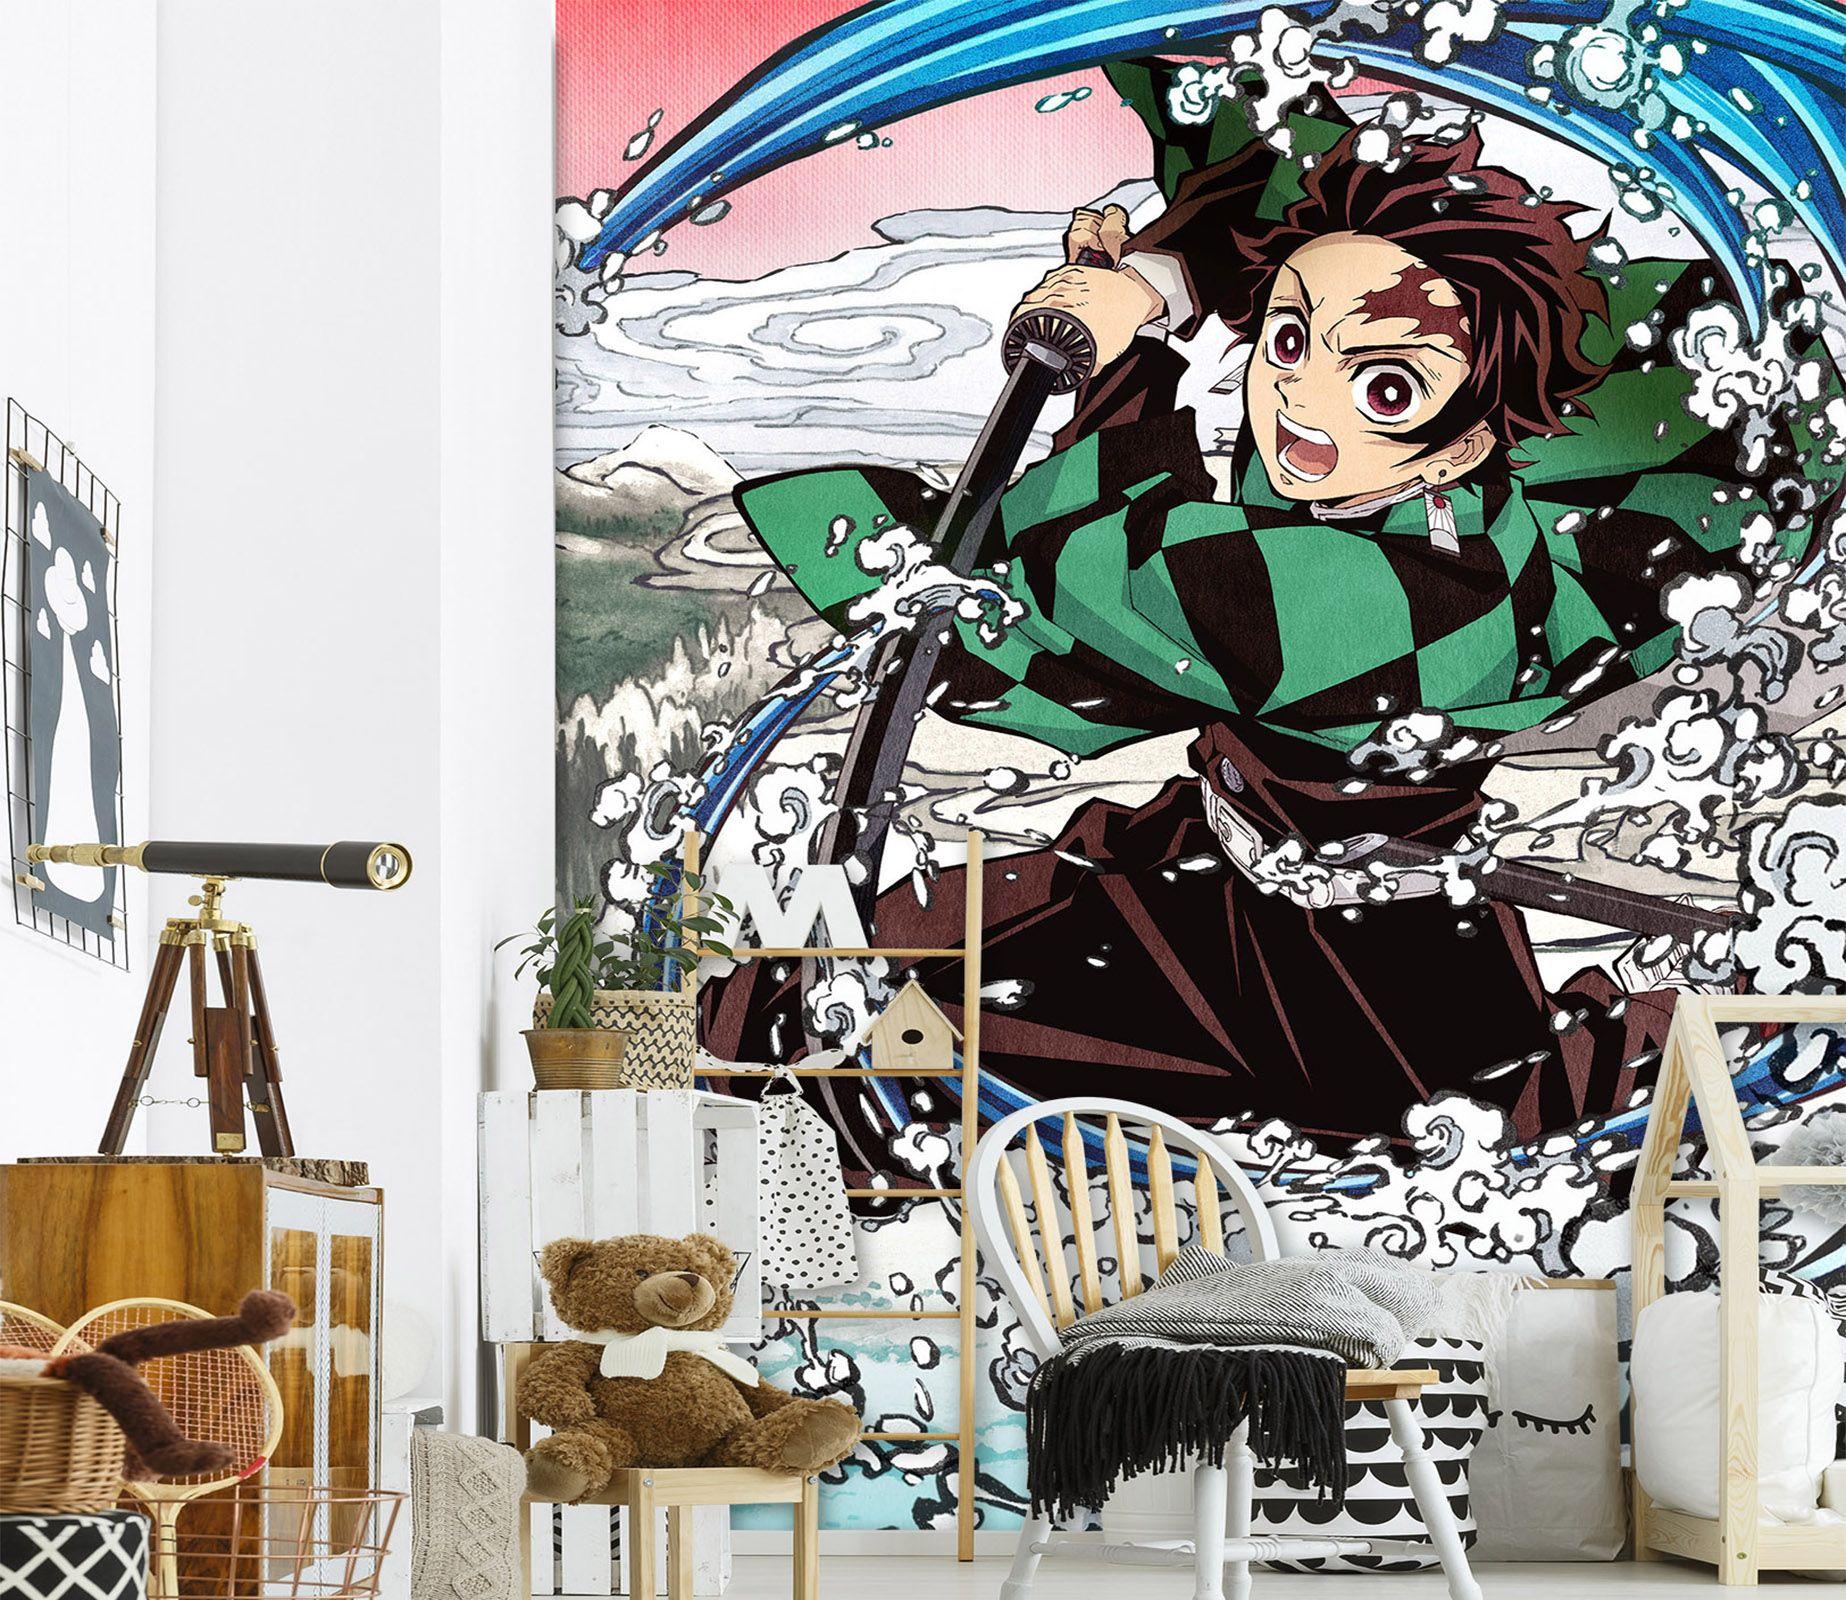 [Self-Adhesive] 3D Kimetsu No Yaiba 0235 Wall Paper mural Wall Print Decal Wall Murals Muzi